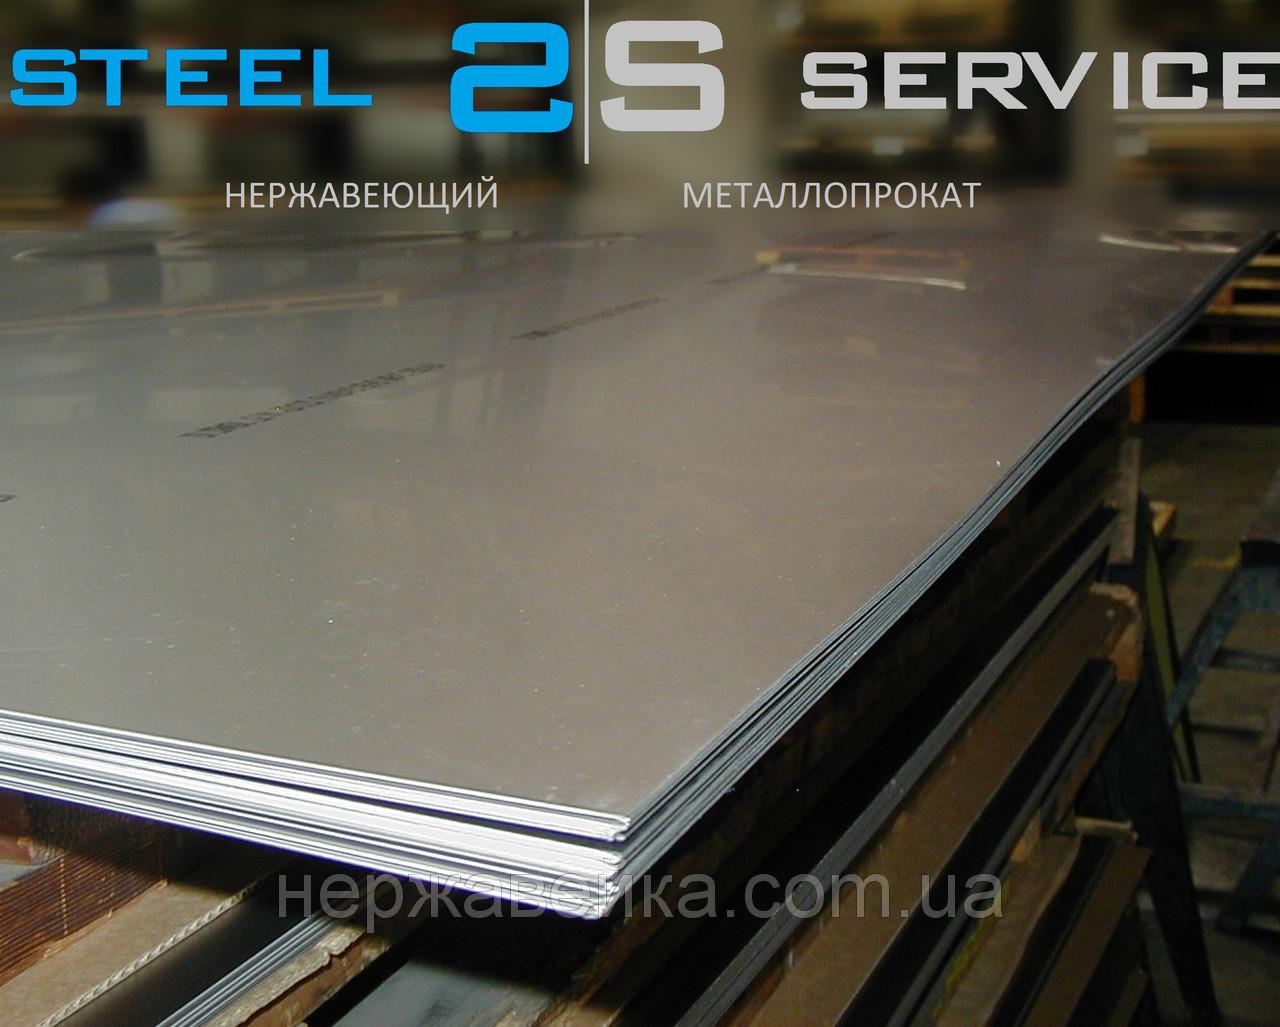 Нержавейка лист 4х1500х6000мм  AISI 316Ti(10Х17Н13М2Т) 2B - матовый,  кислотостойкий